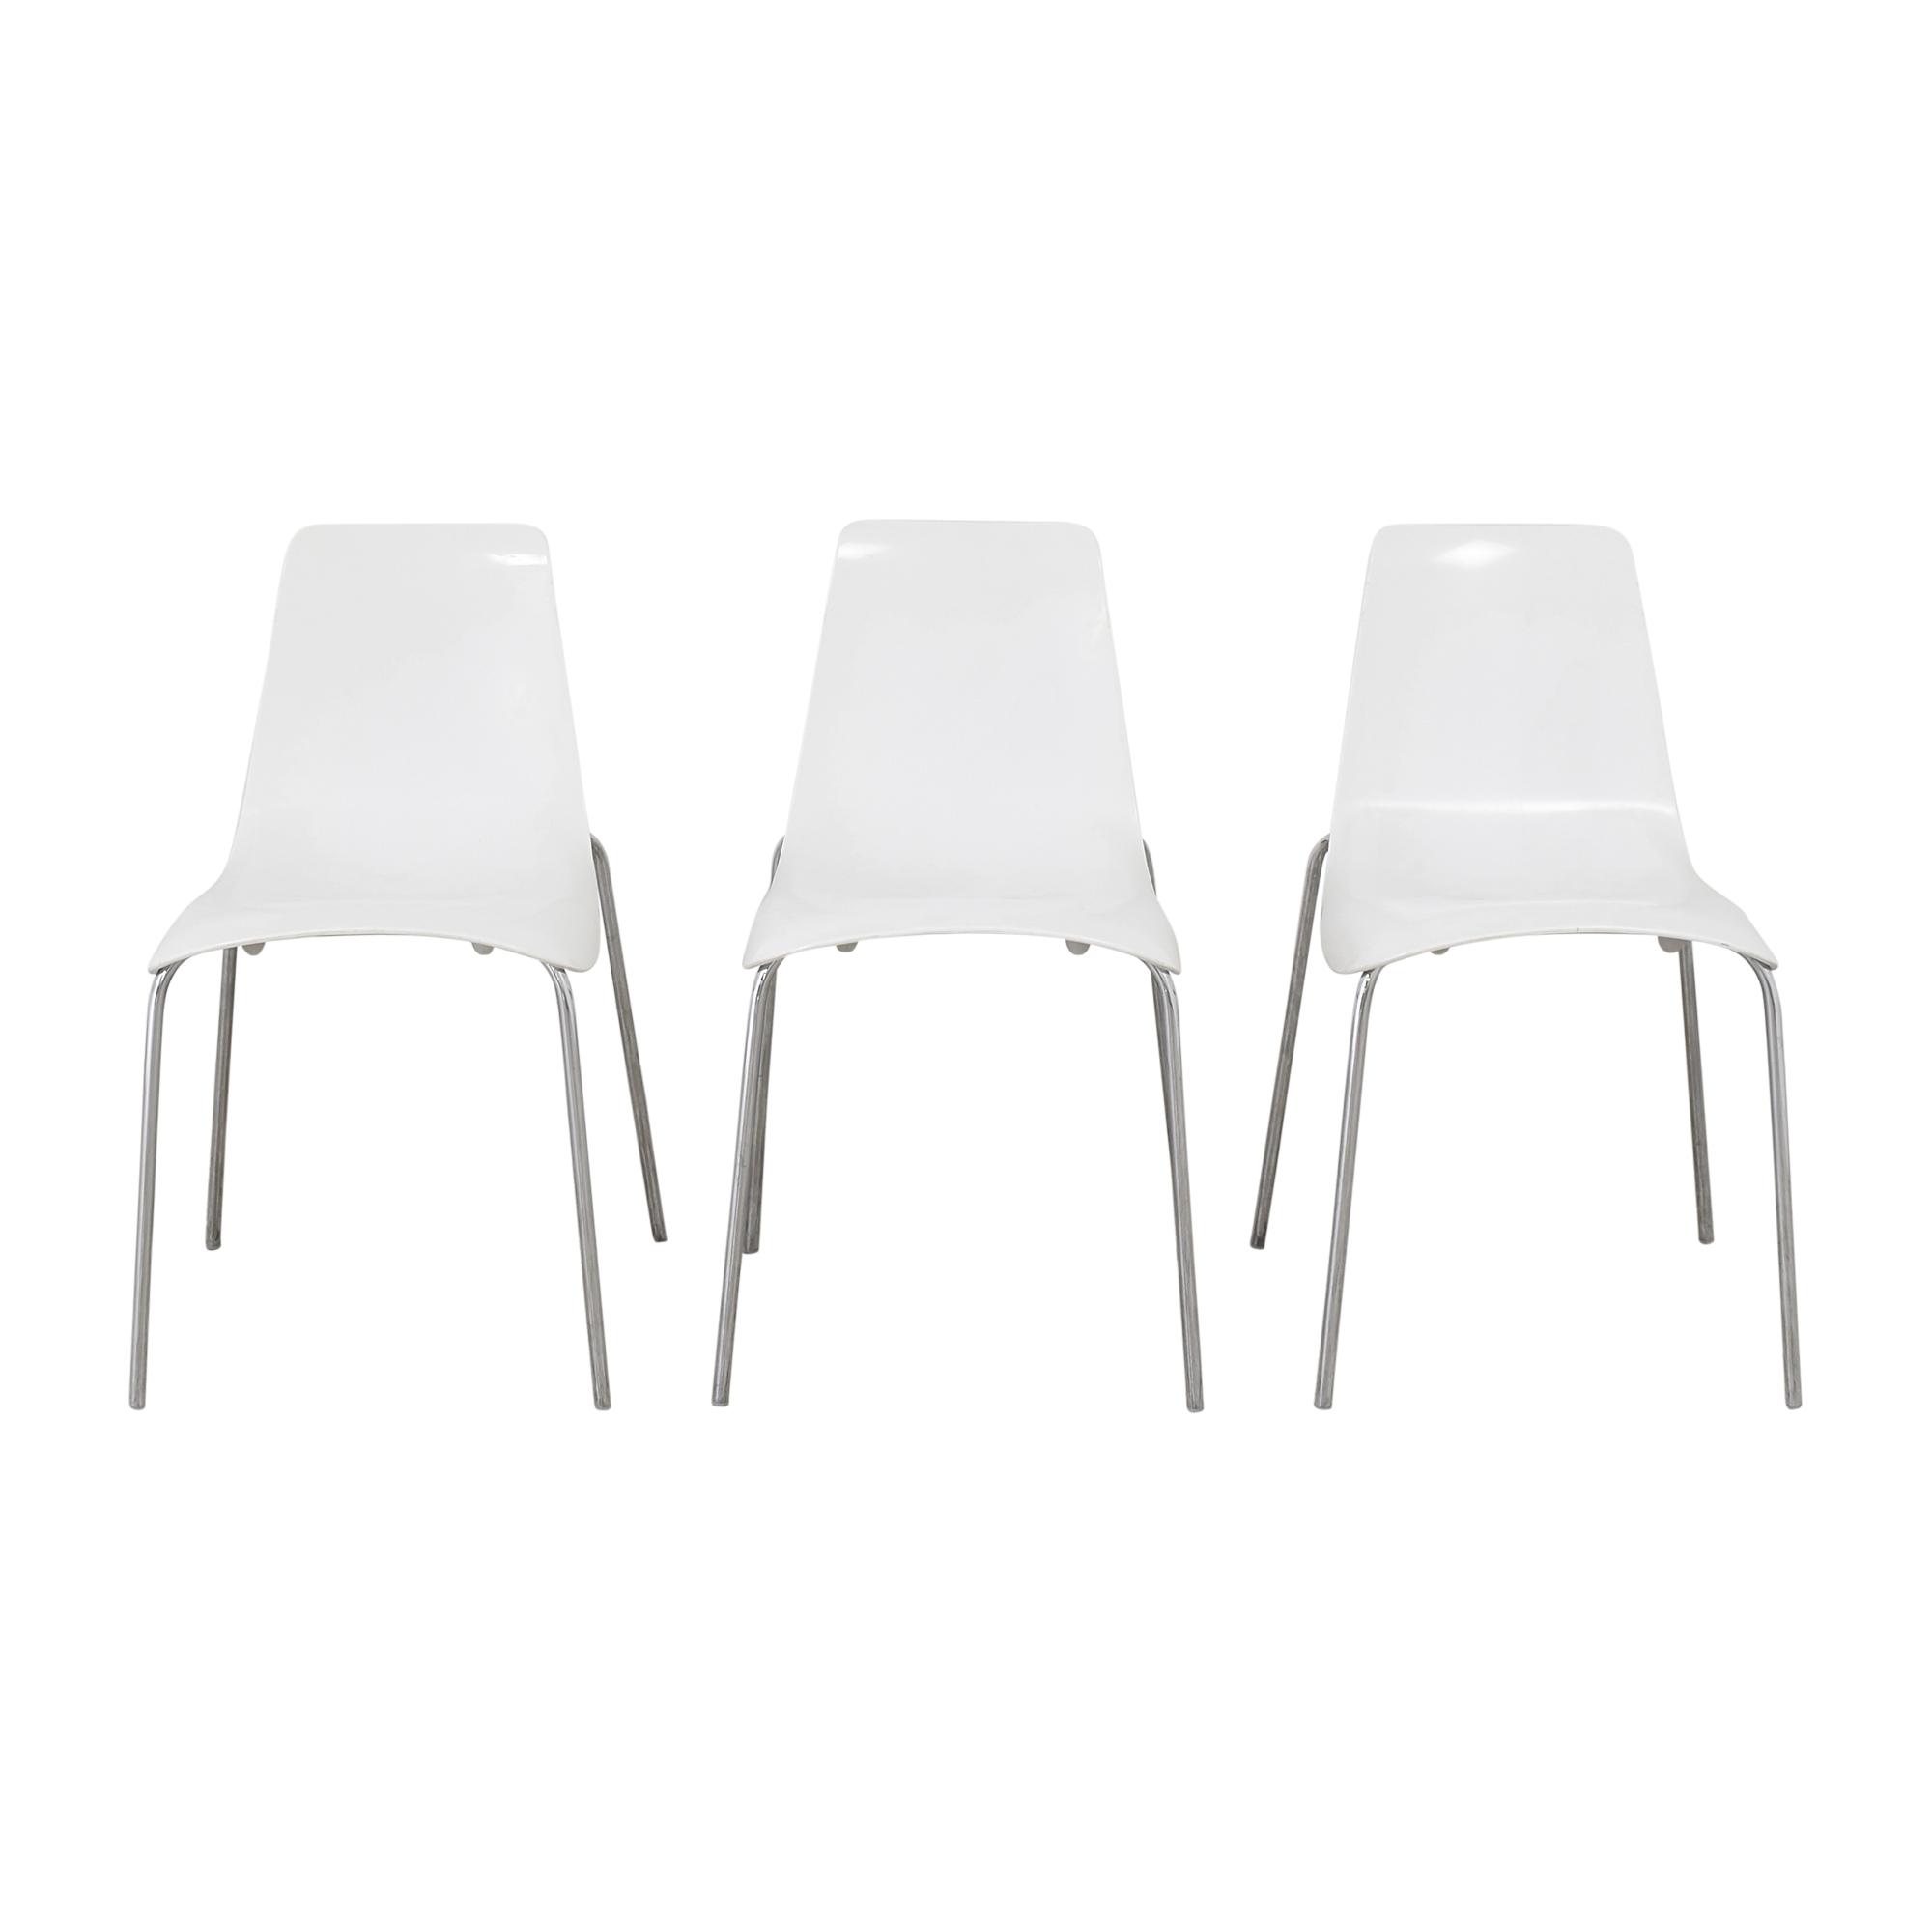 Bonaldo Bonaldo Lei Stackable Chairs for sale